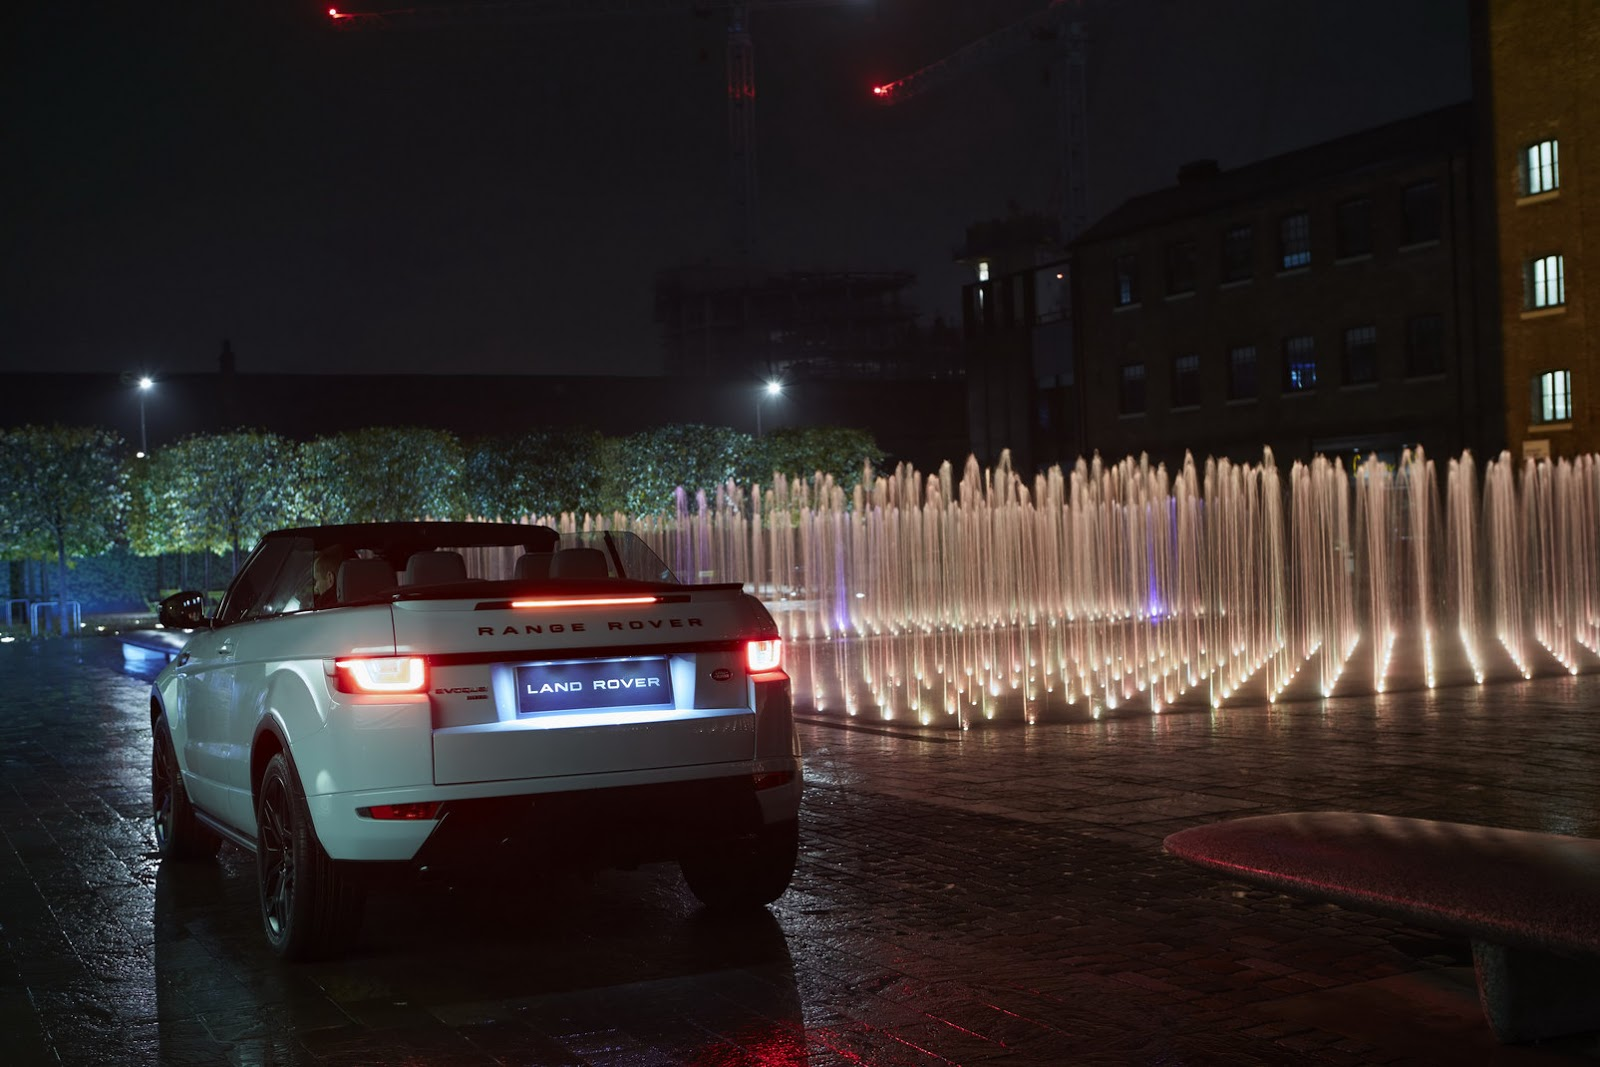 New-Range-Rover-Evoque-Convertible-33 2017 ரேஞ்ச்ரோவர் எவோக் கன்வெர்டிபிள் அறிமுகம் - LA AUTO SHOW 2015